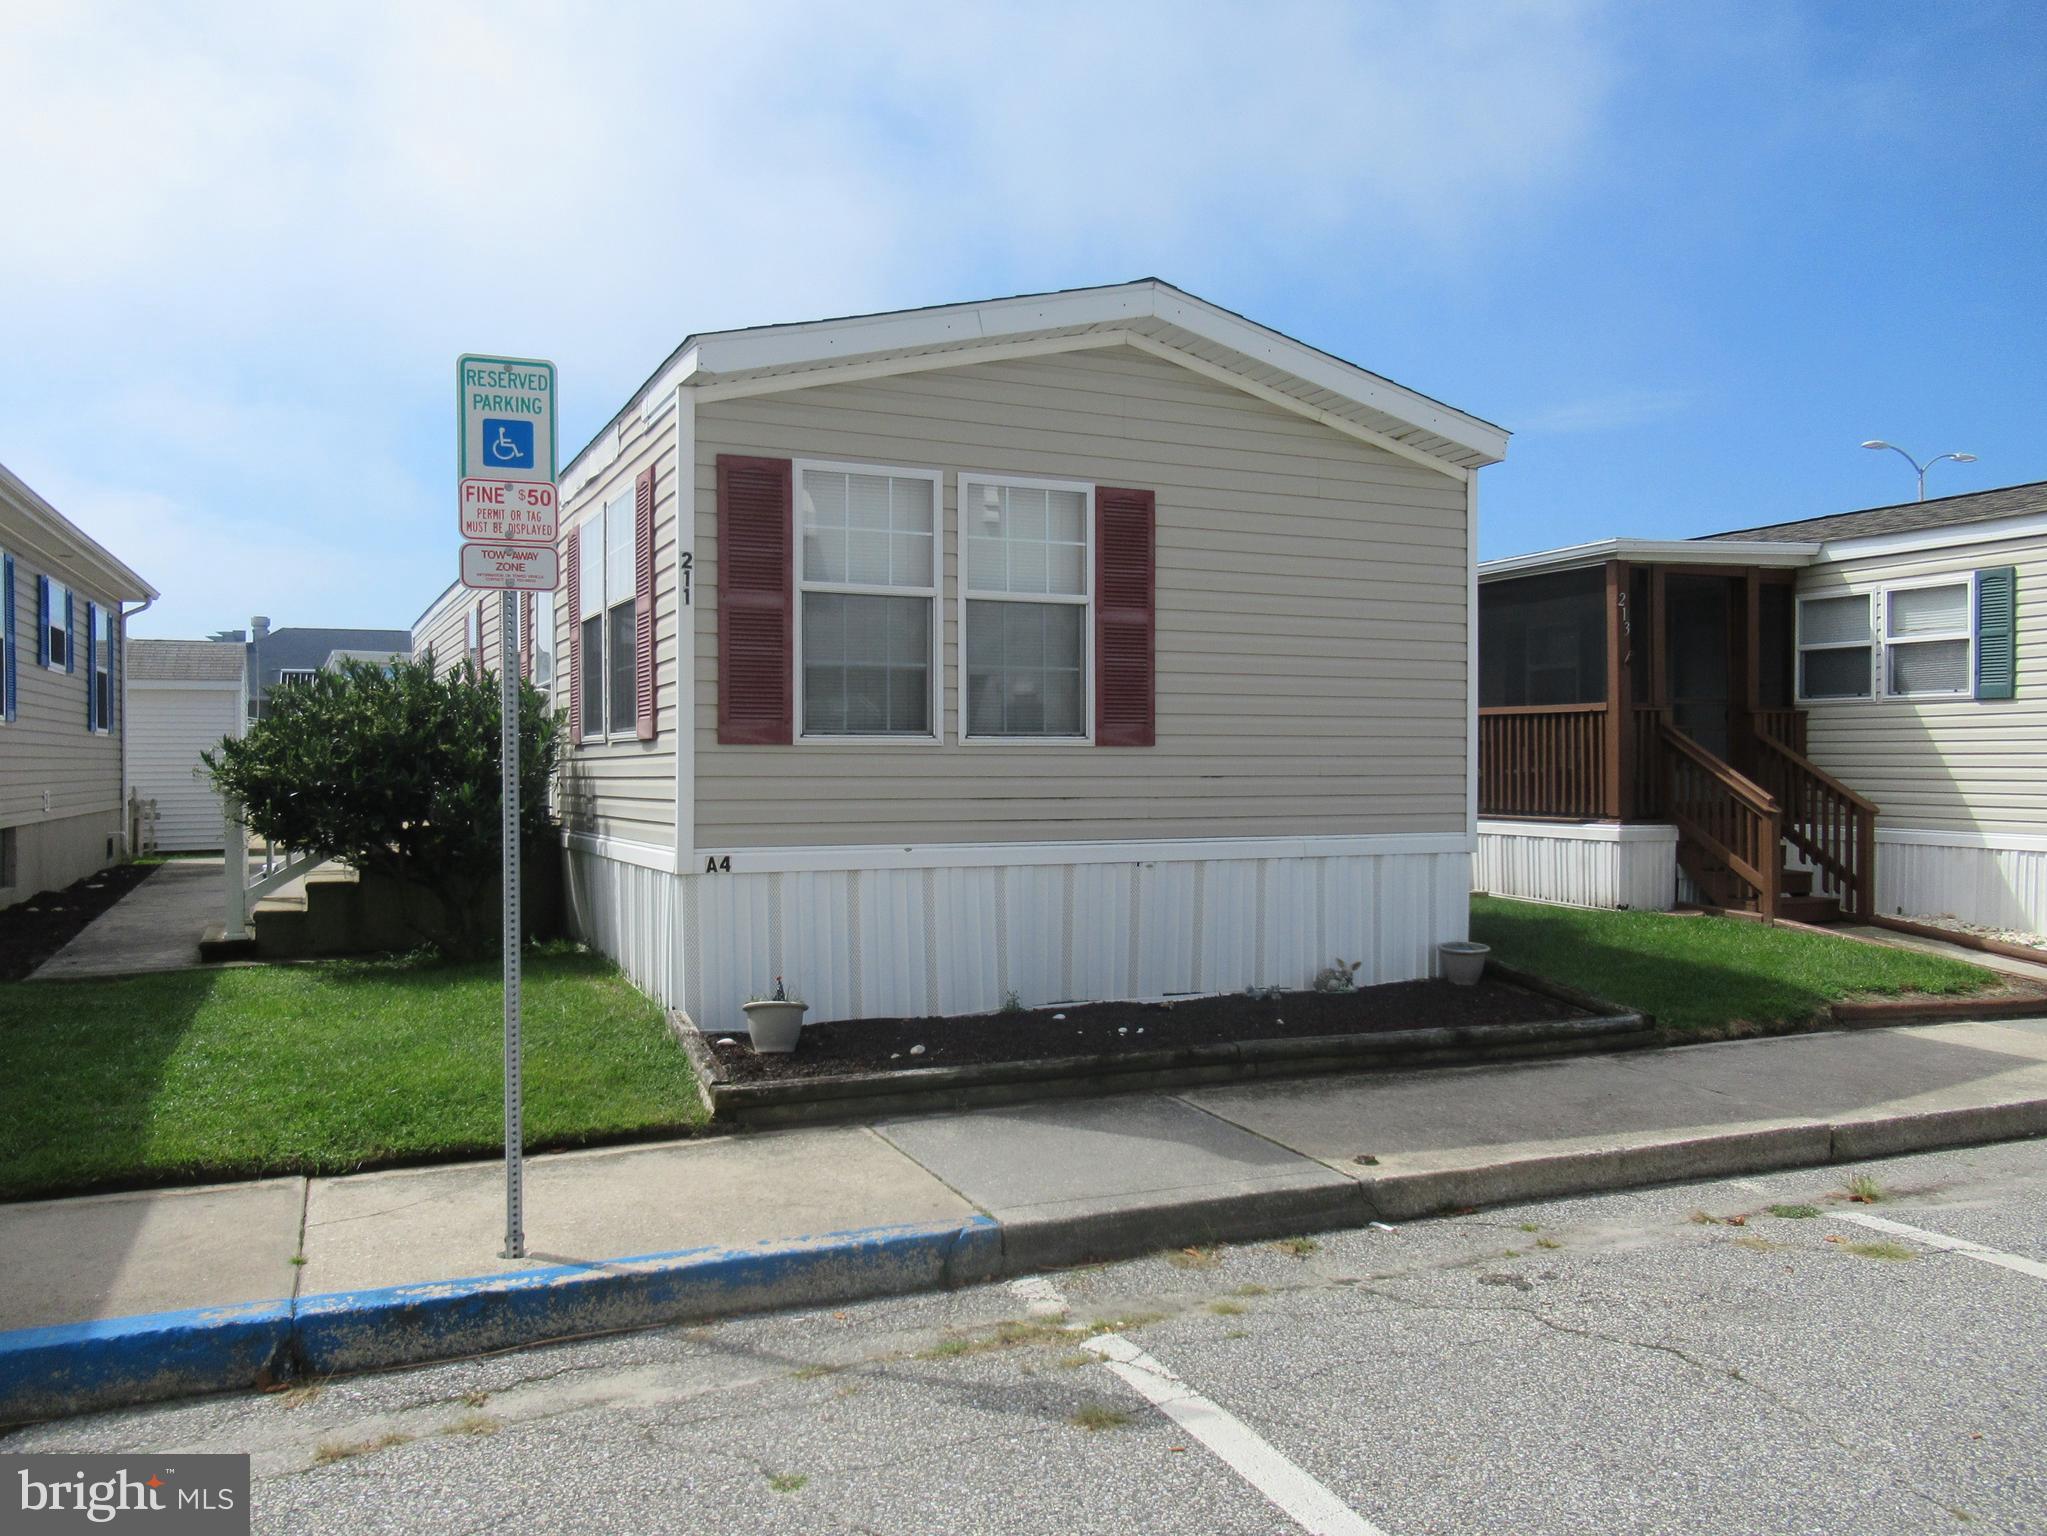 211 (Lot 4A) 25th St, Ocean City, MD, 21842